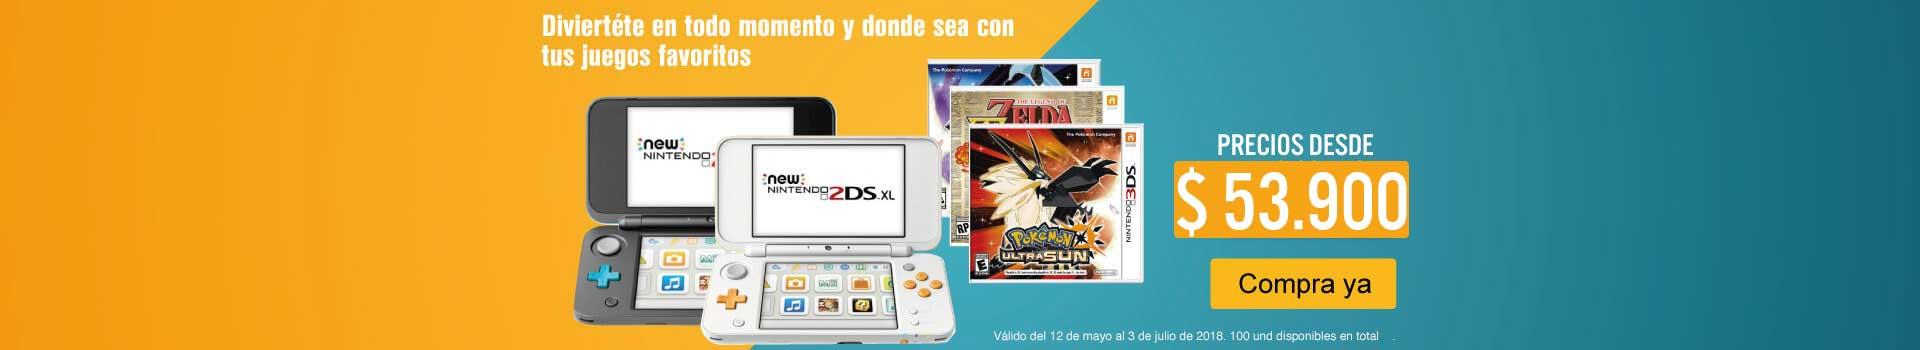 KT-BCAT-17-videojuegos-EVE---3DS-DESC-jun7